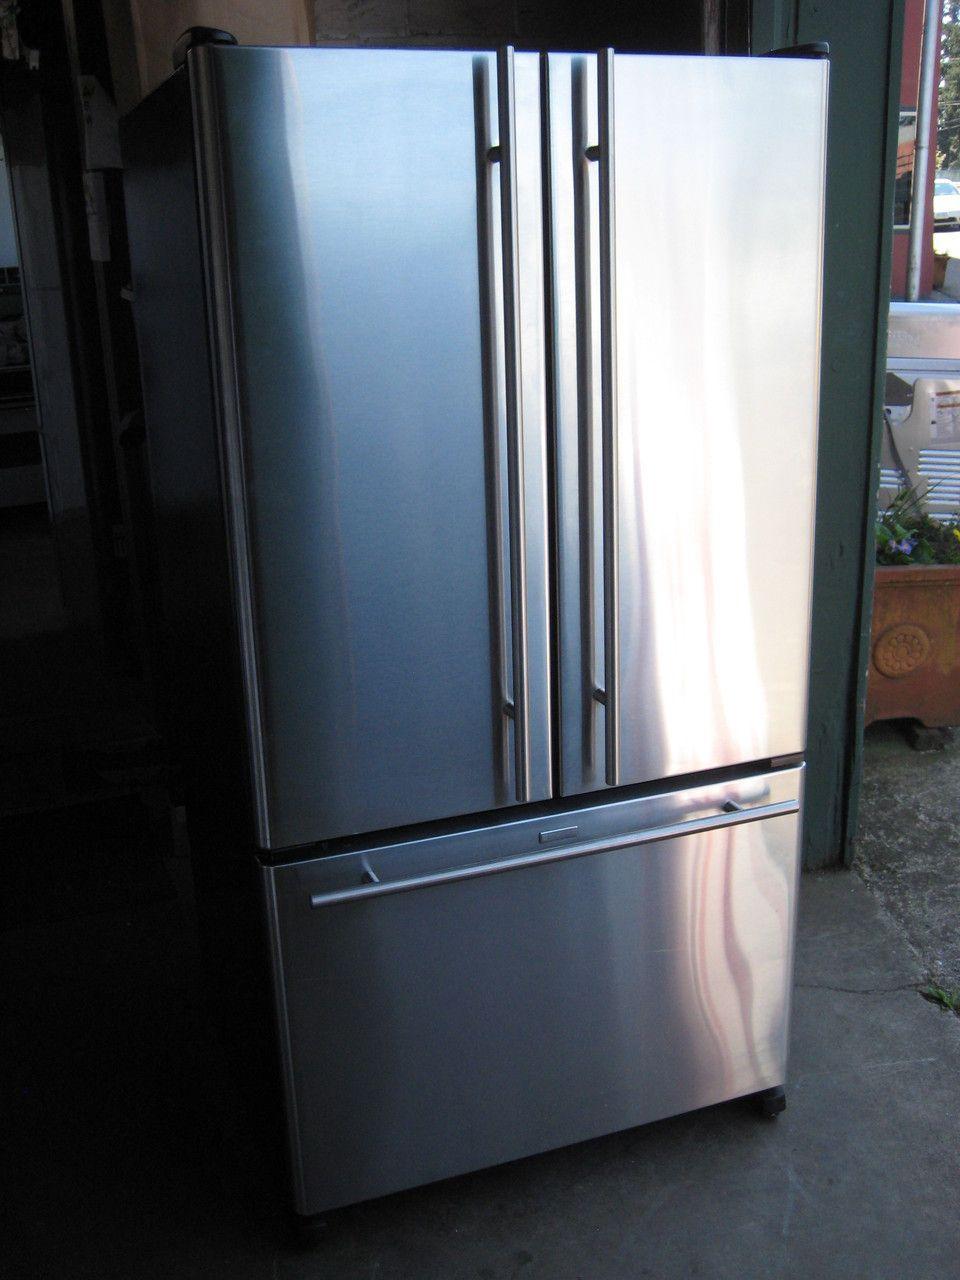 Appliance City - Jenn-Air bottom freezer refrigerator ...